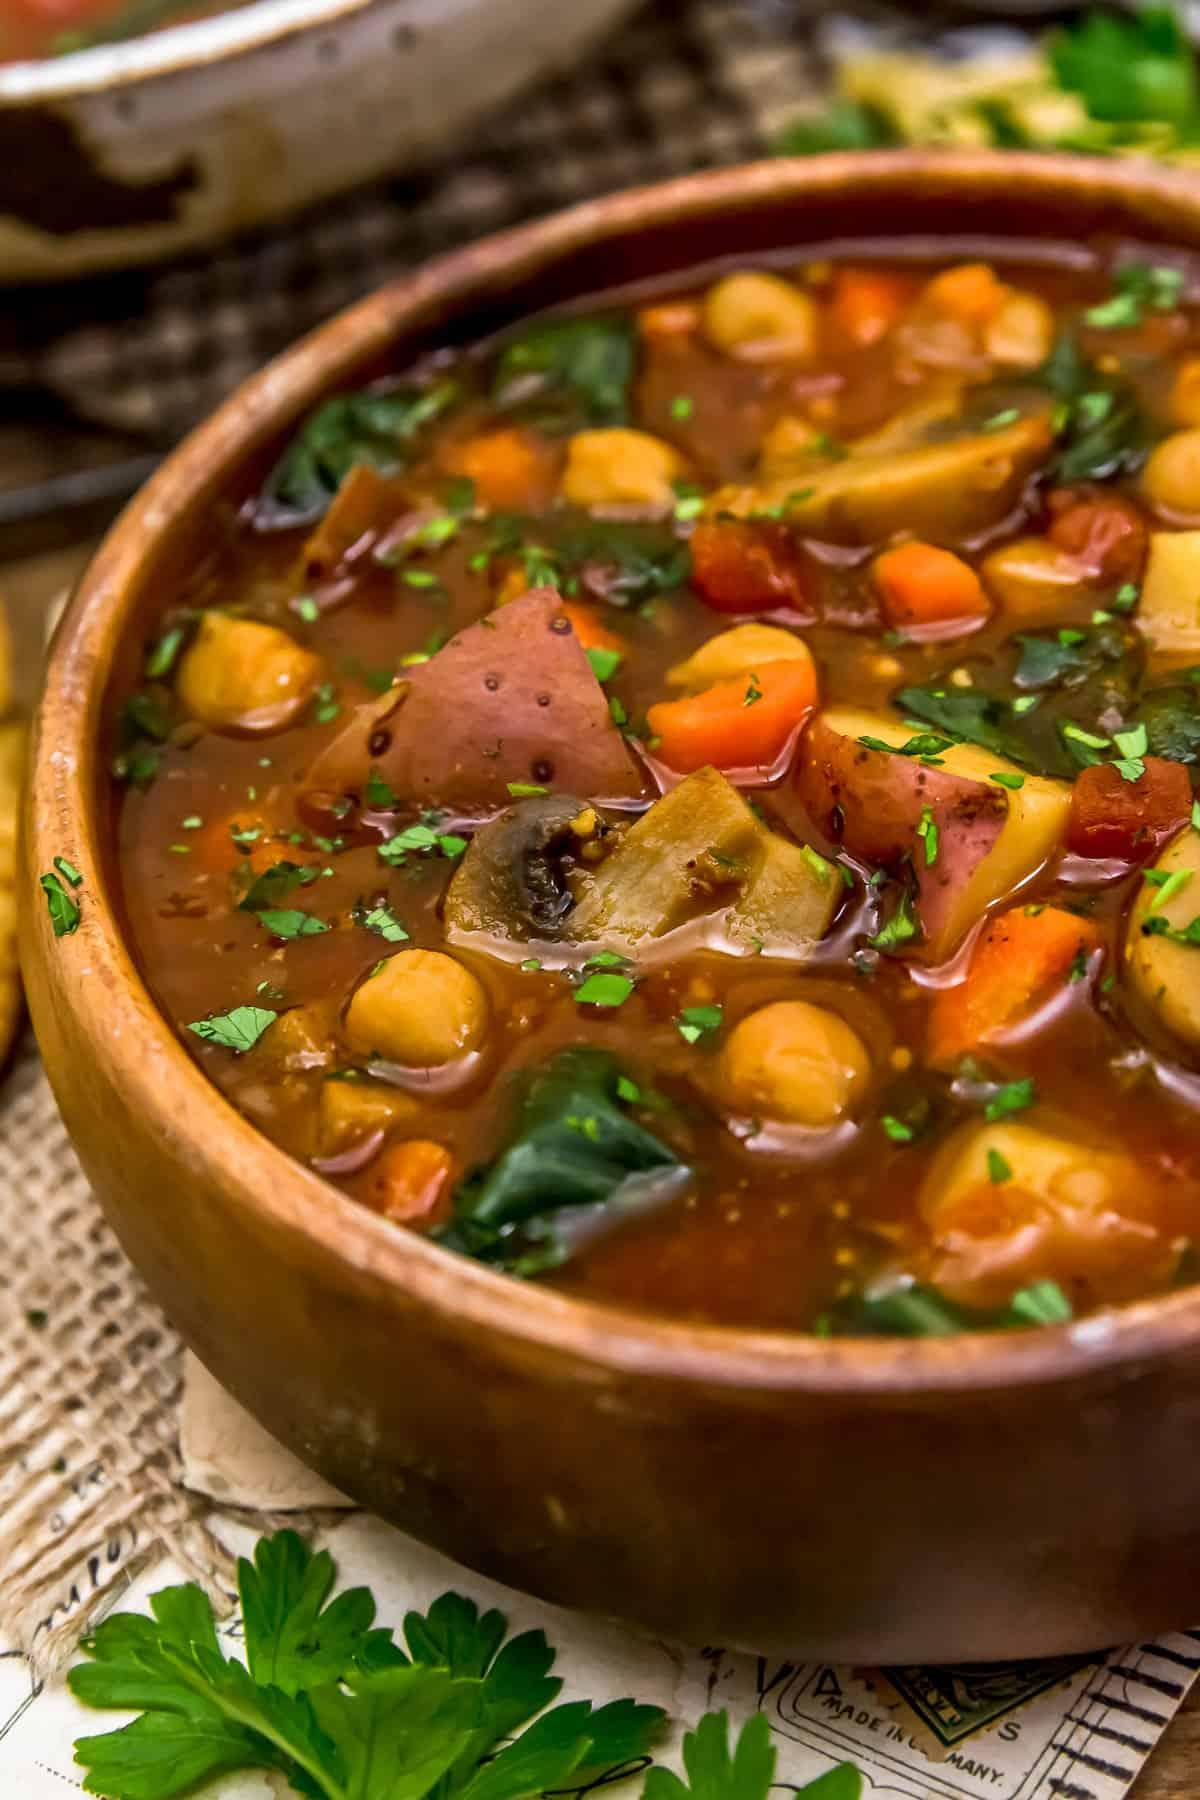 Bowl of Chickpea Mushroom Shawarma Soup